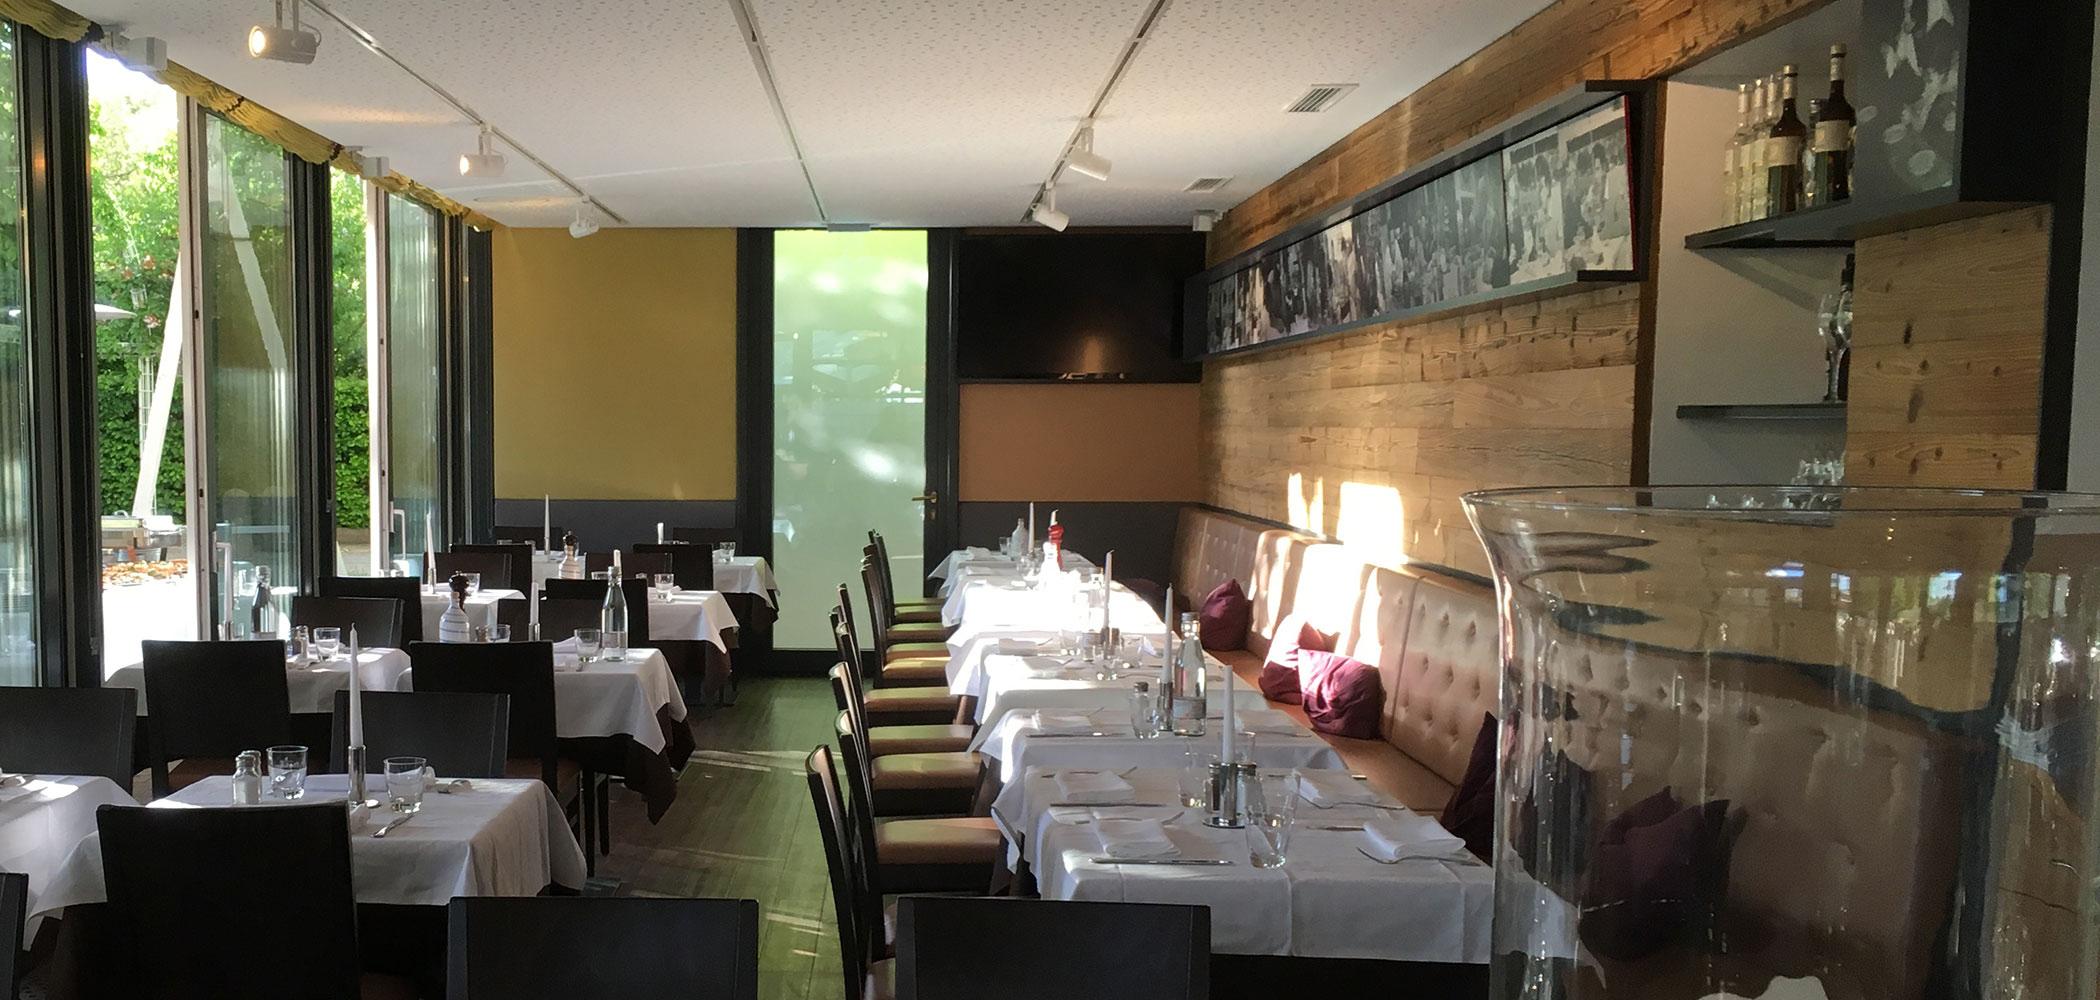 Best Ristoranti Montevecchia Terrazze Photos - Design and Ideas ...